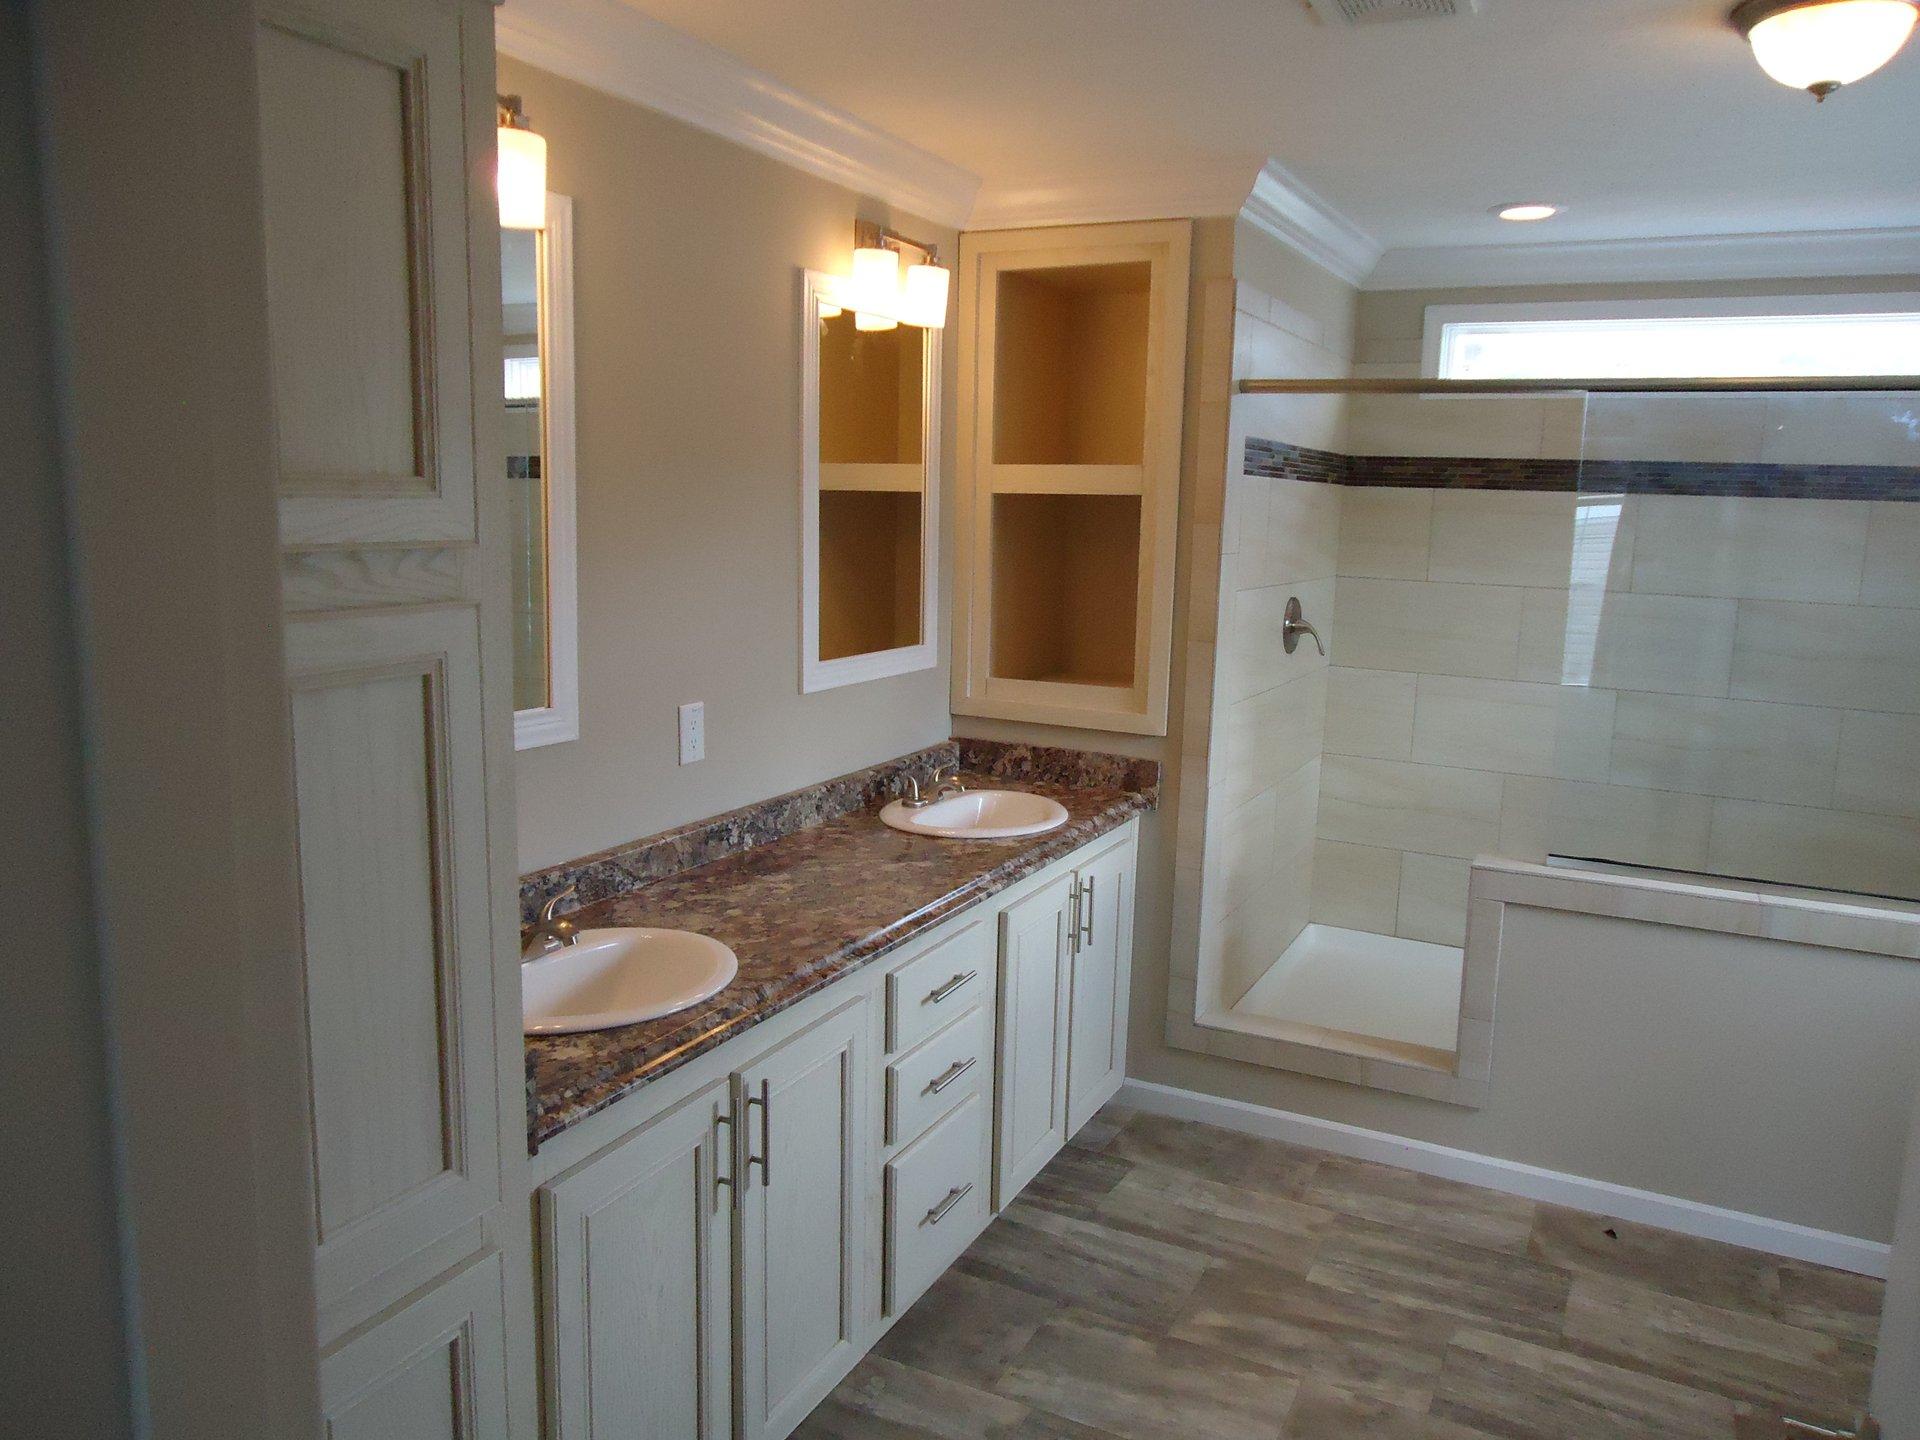 Cavalier bathroom furniture - View All